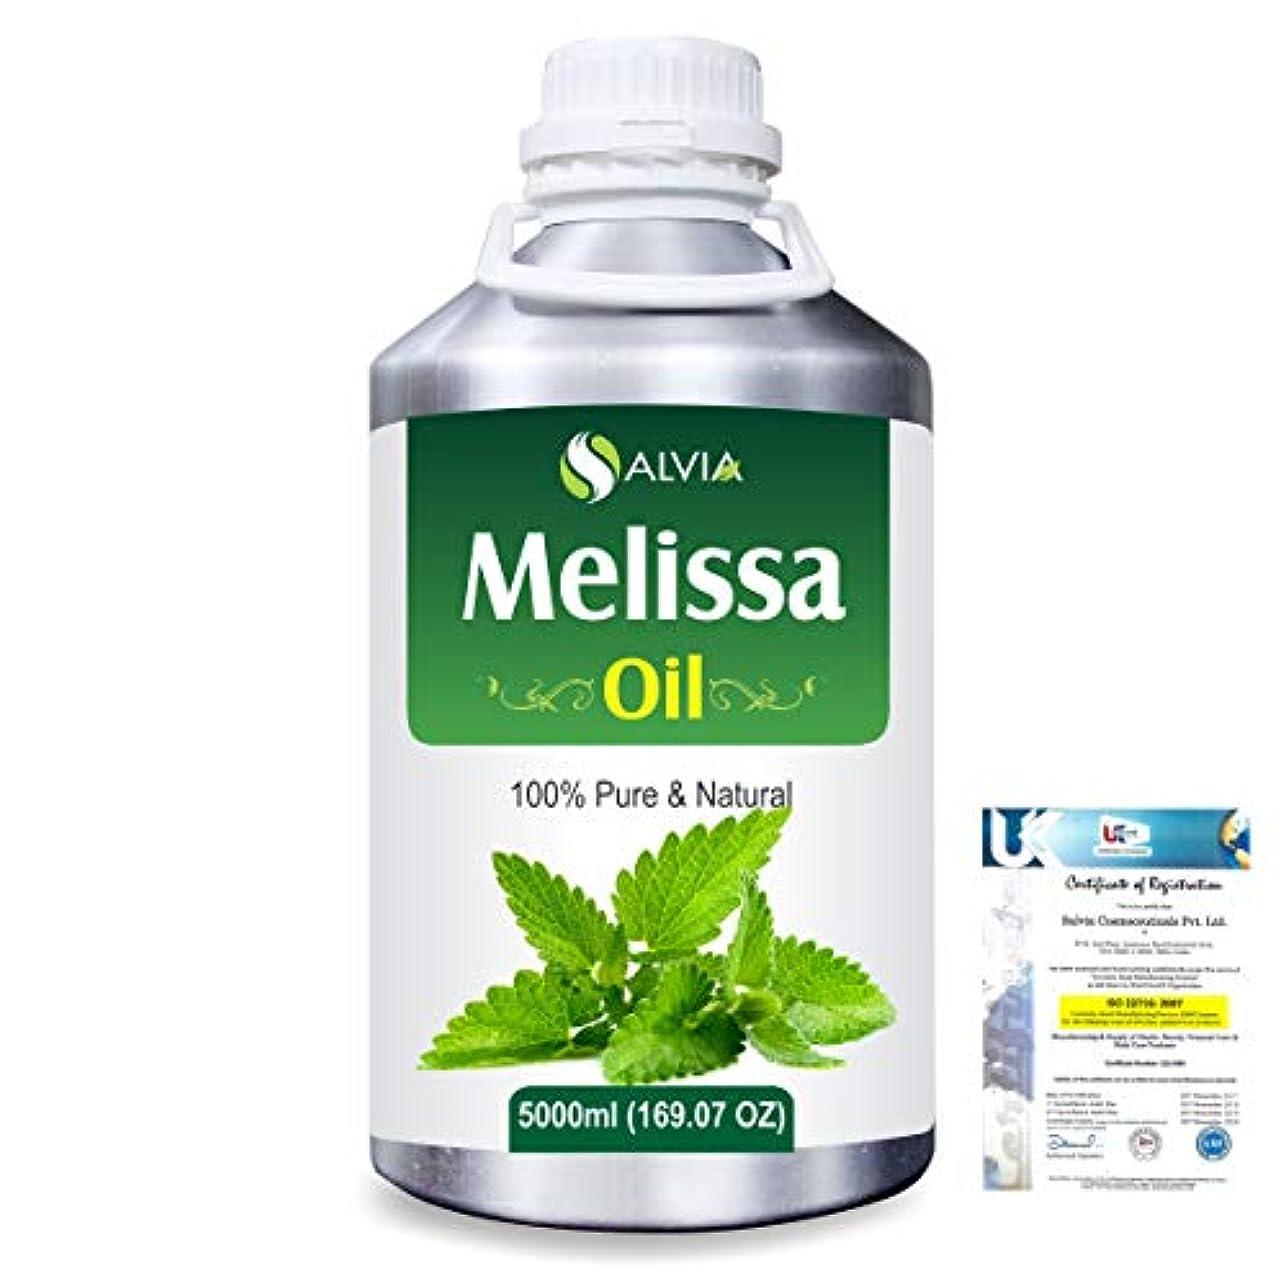 Melissa (Melissa officinalis) 100% Natural Pure Essential Oil 5000ml/169fl.oz.